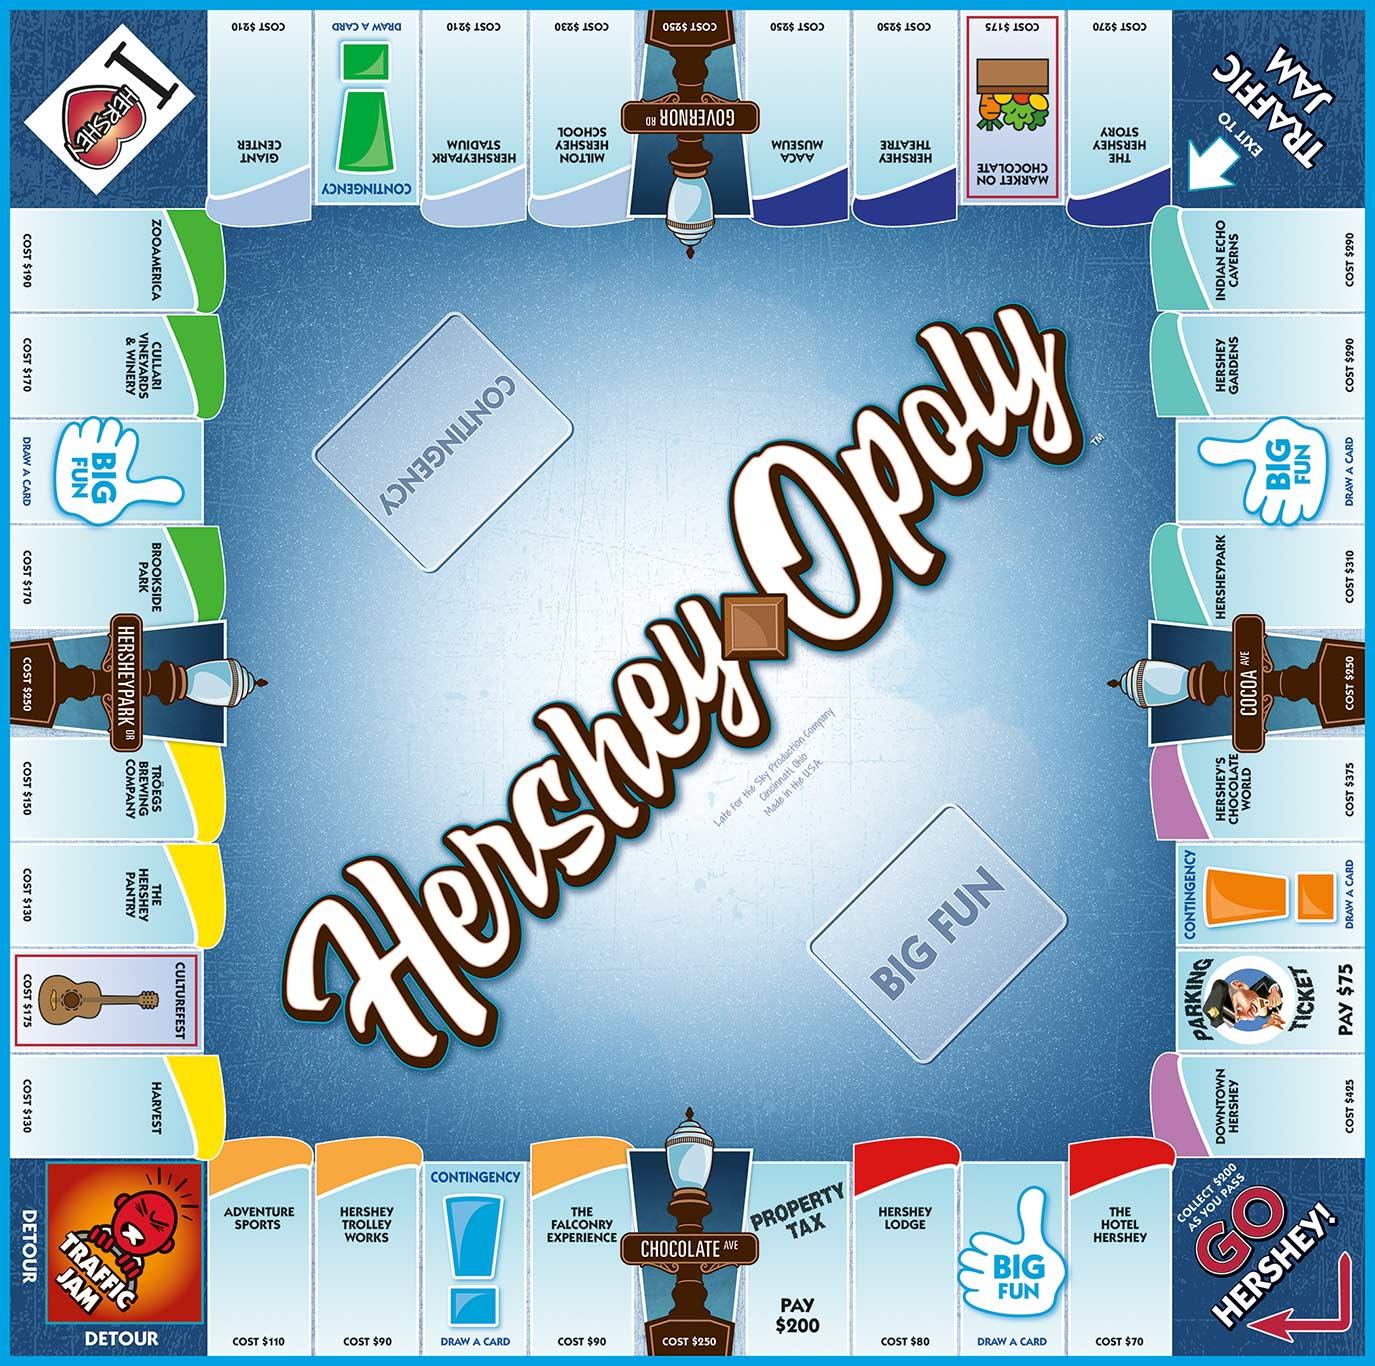 HERSHEY-OPOLY Board Game